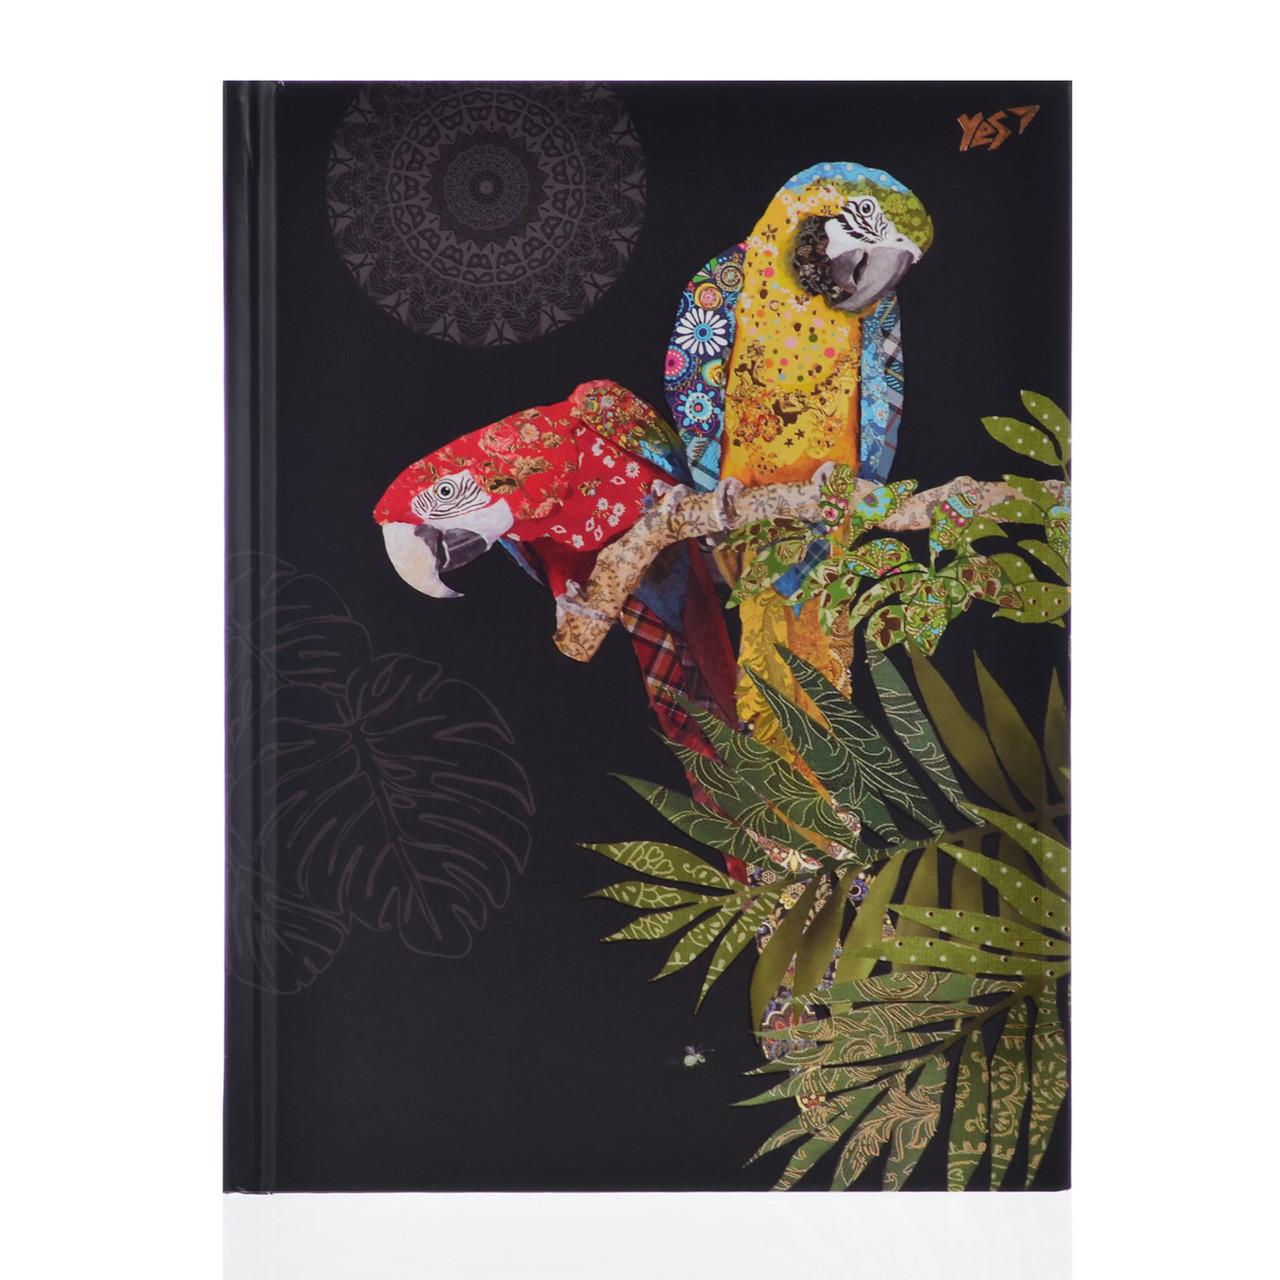 "Блокнот А5/96 КЛ. 7БЦ, фольга золото+Уф.выб. ""BugArt. Black parrot"" YES"